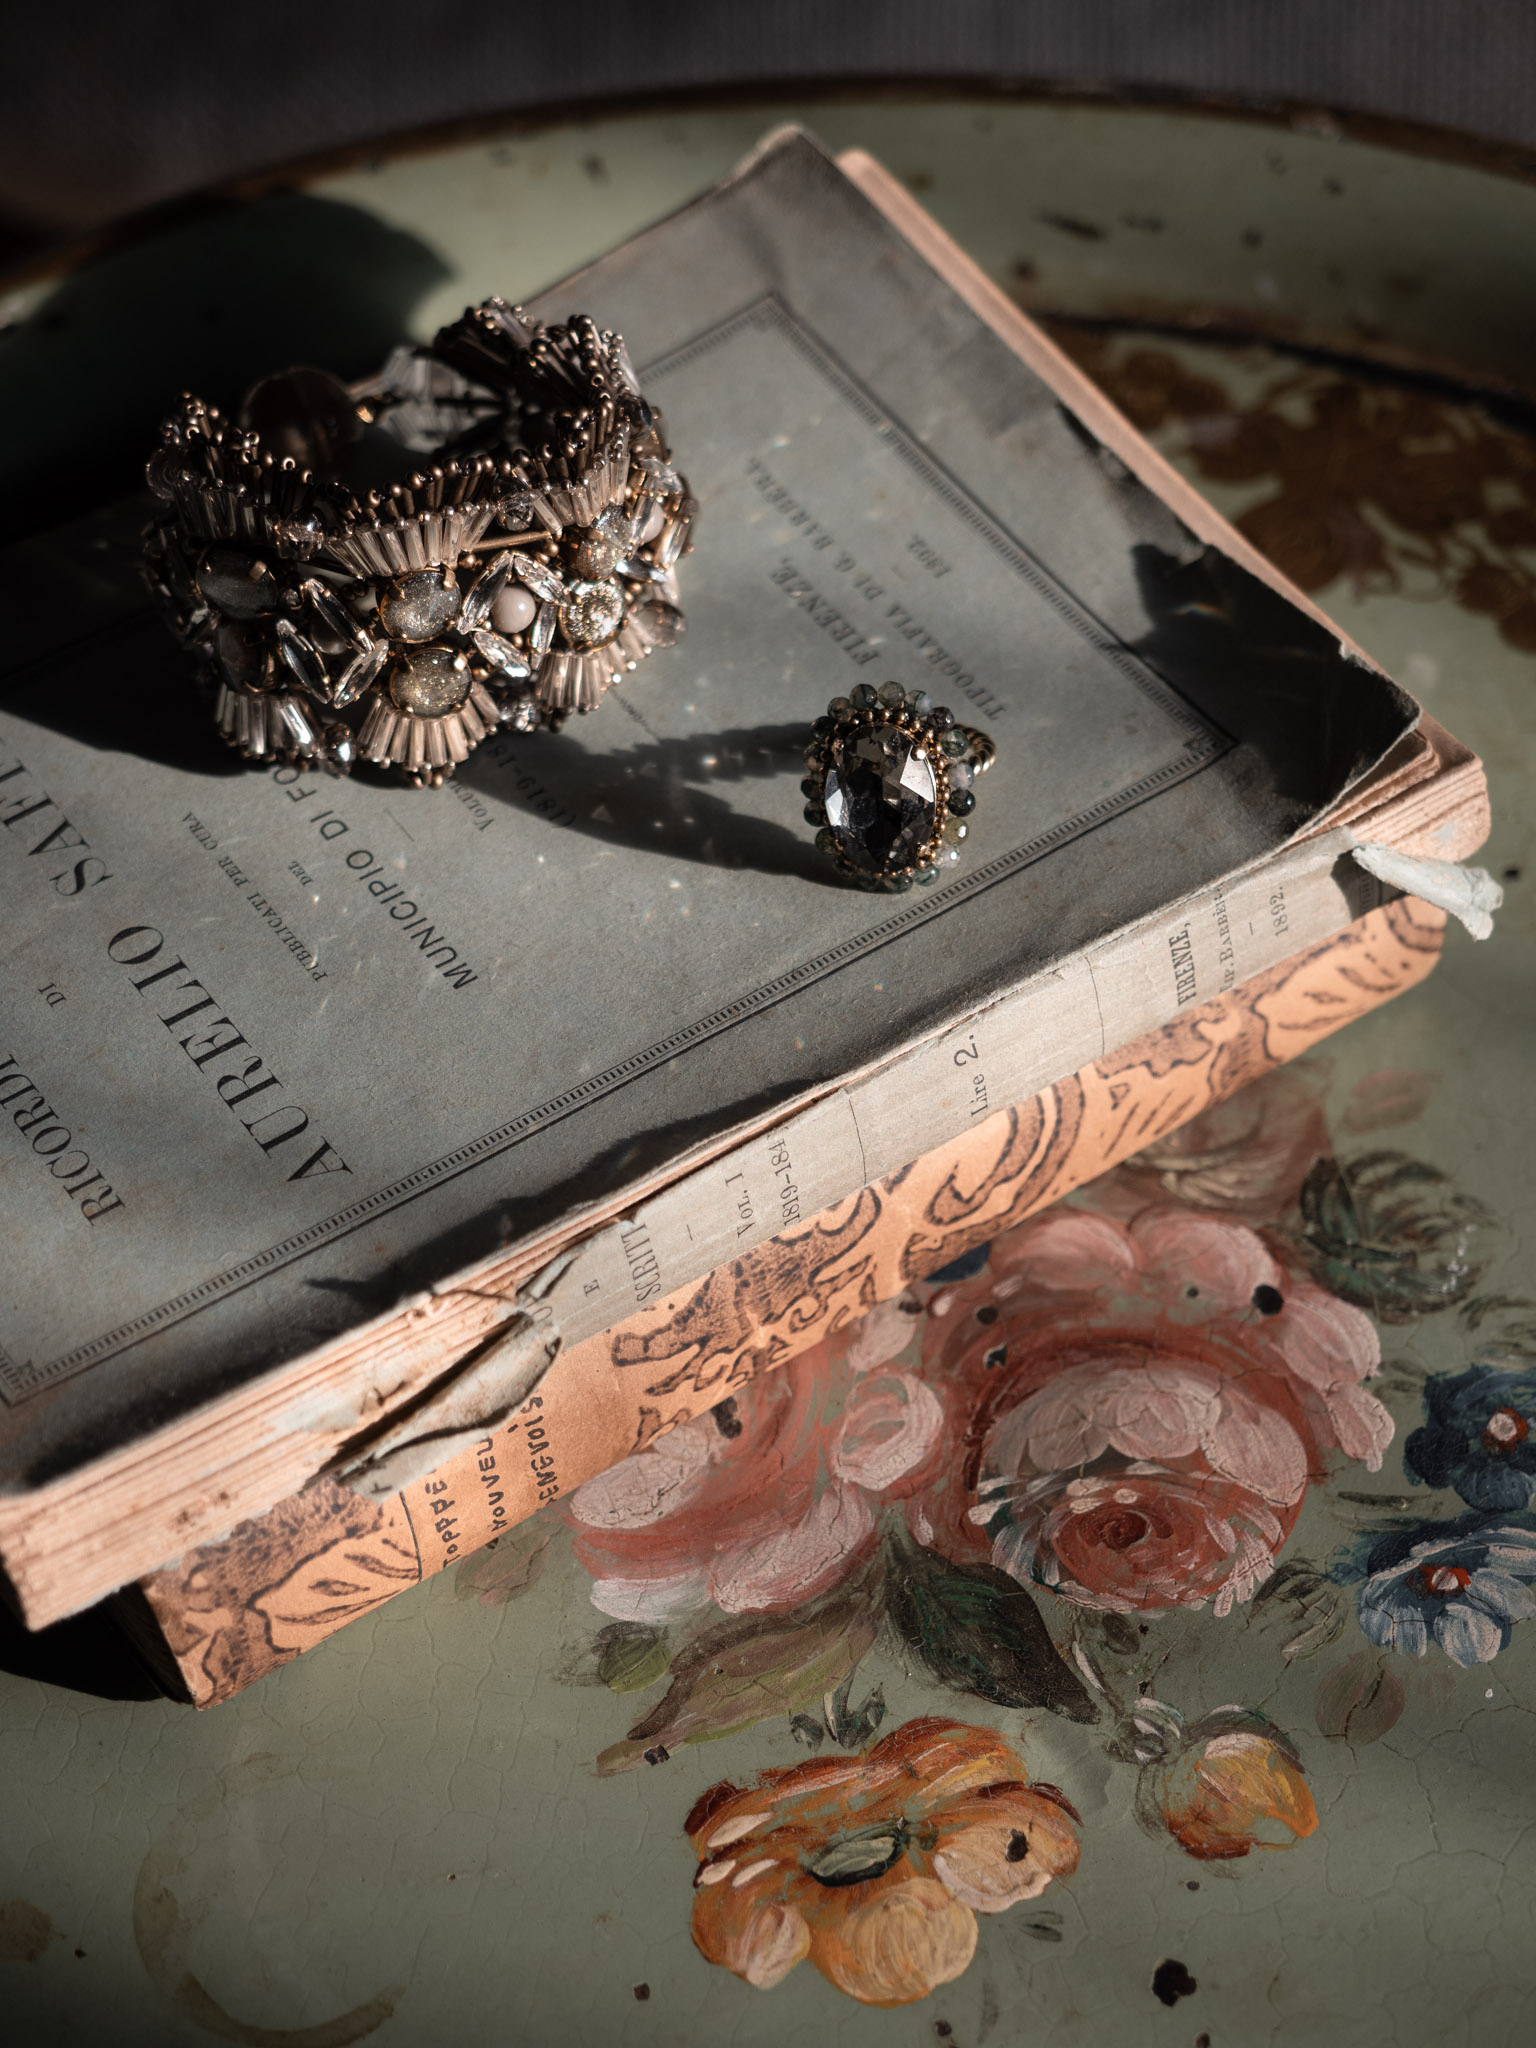 Tata Borello handmade bijoux